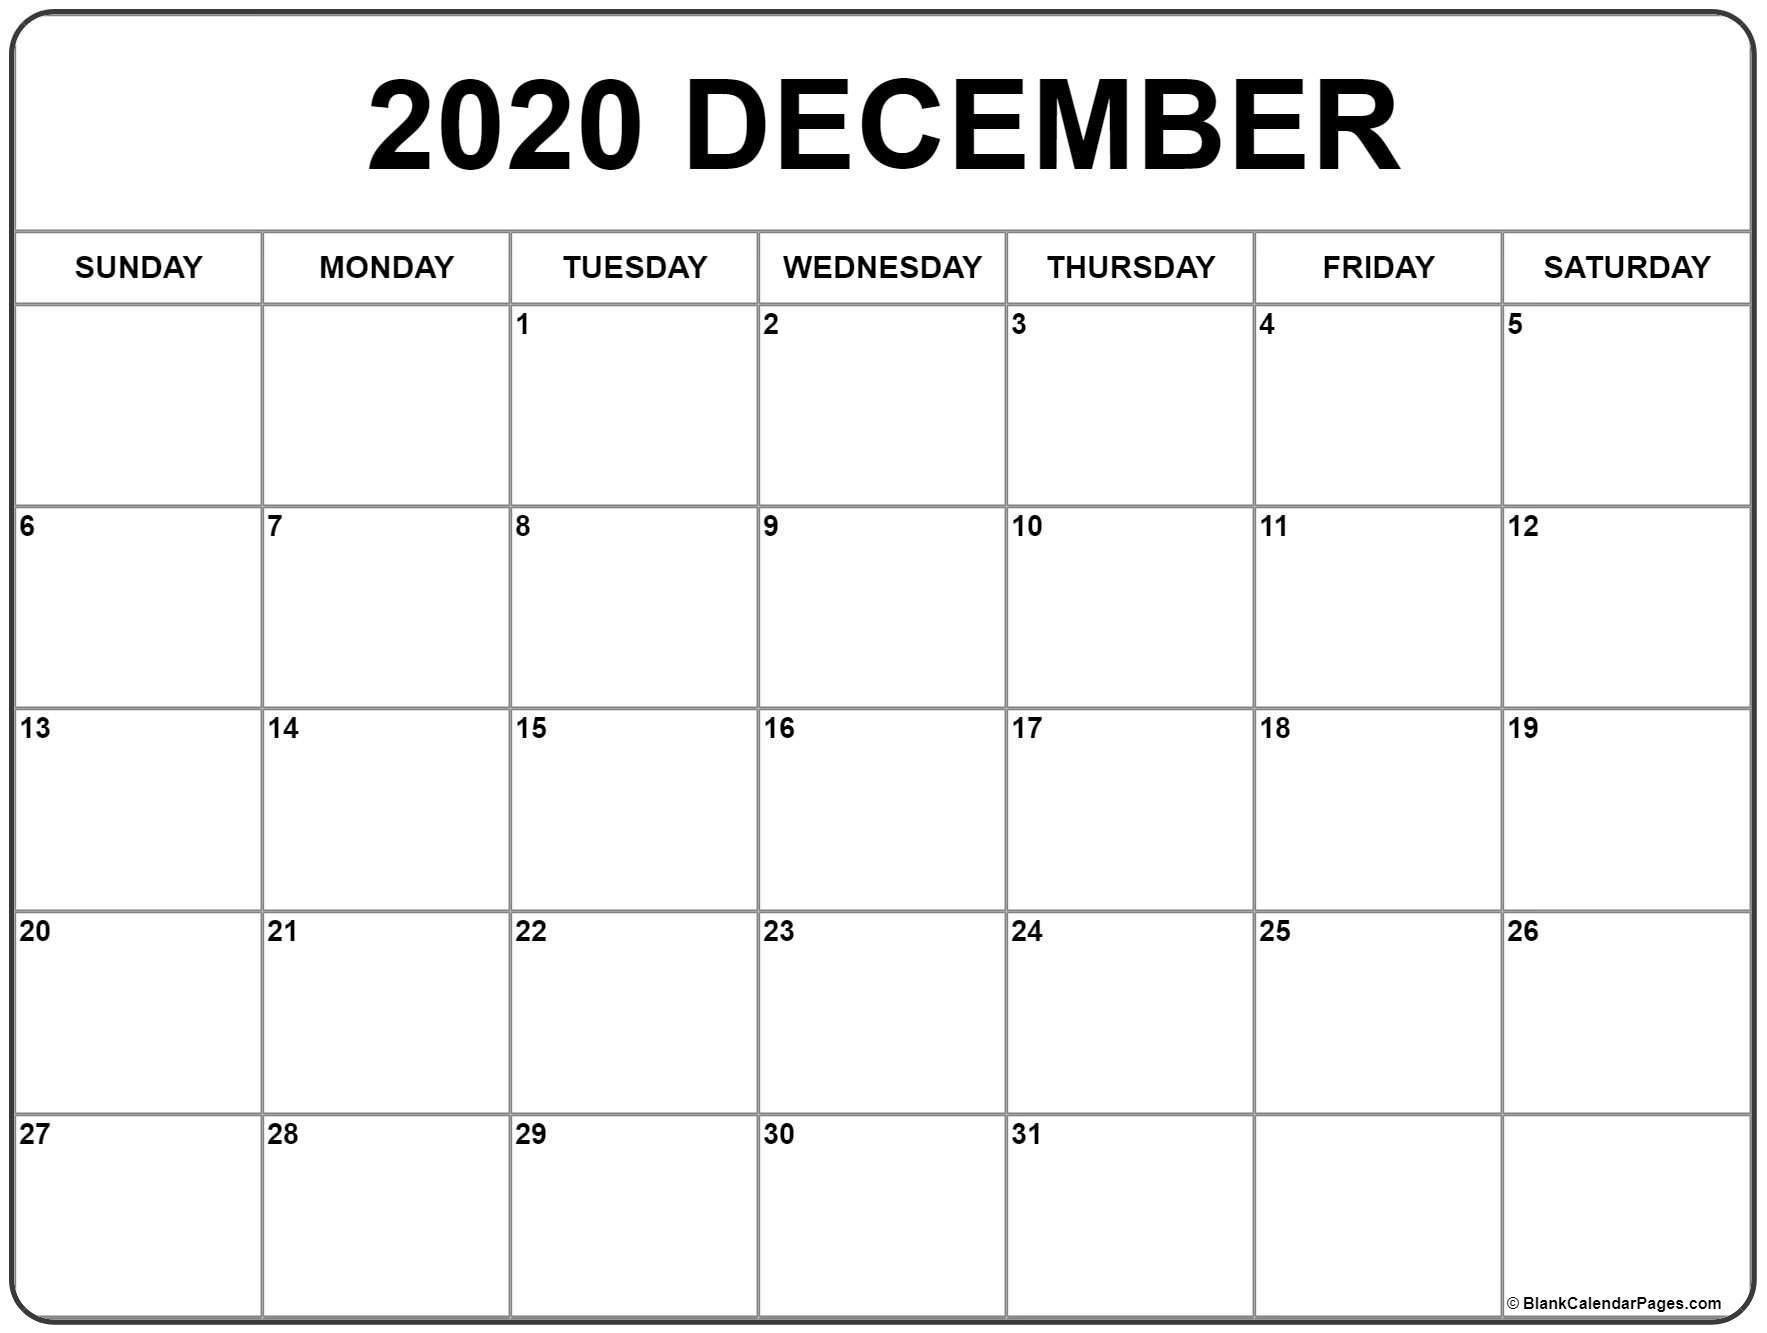 December 2020 Printable Calendar Template #2020Calendars  Fill In Calendar Template 2020